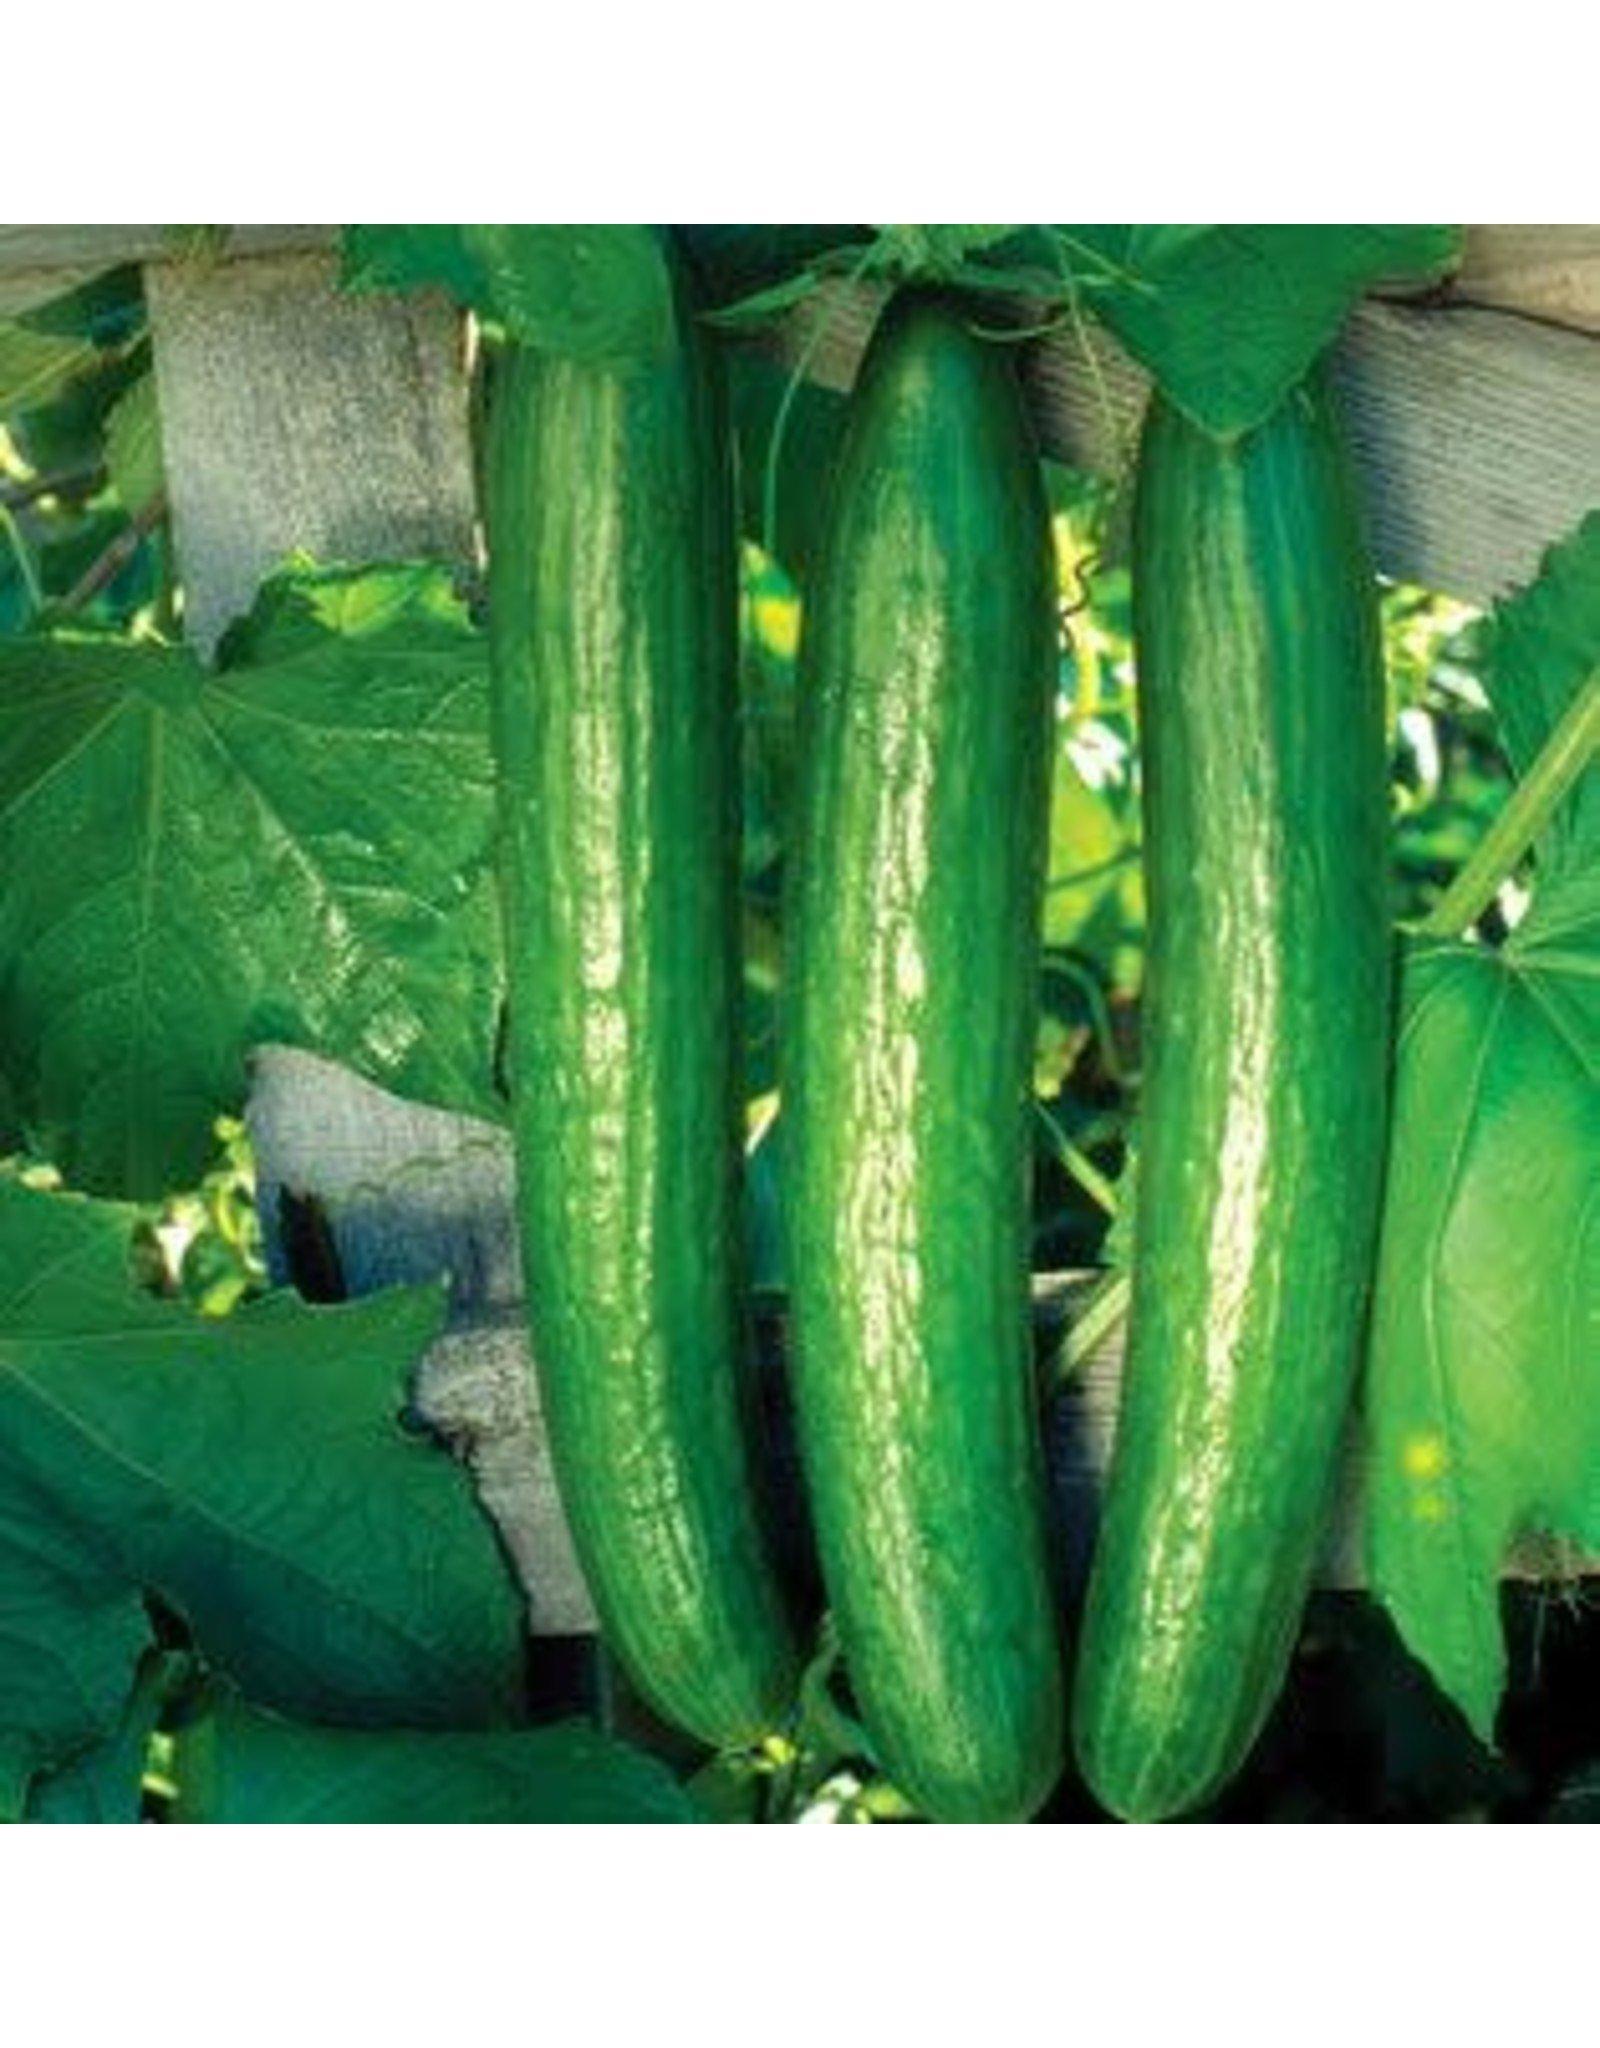 Early Spring Burpless Hybrid Cucumber Seeds (Aimers International) 2810